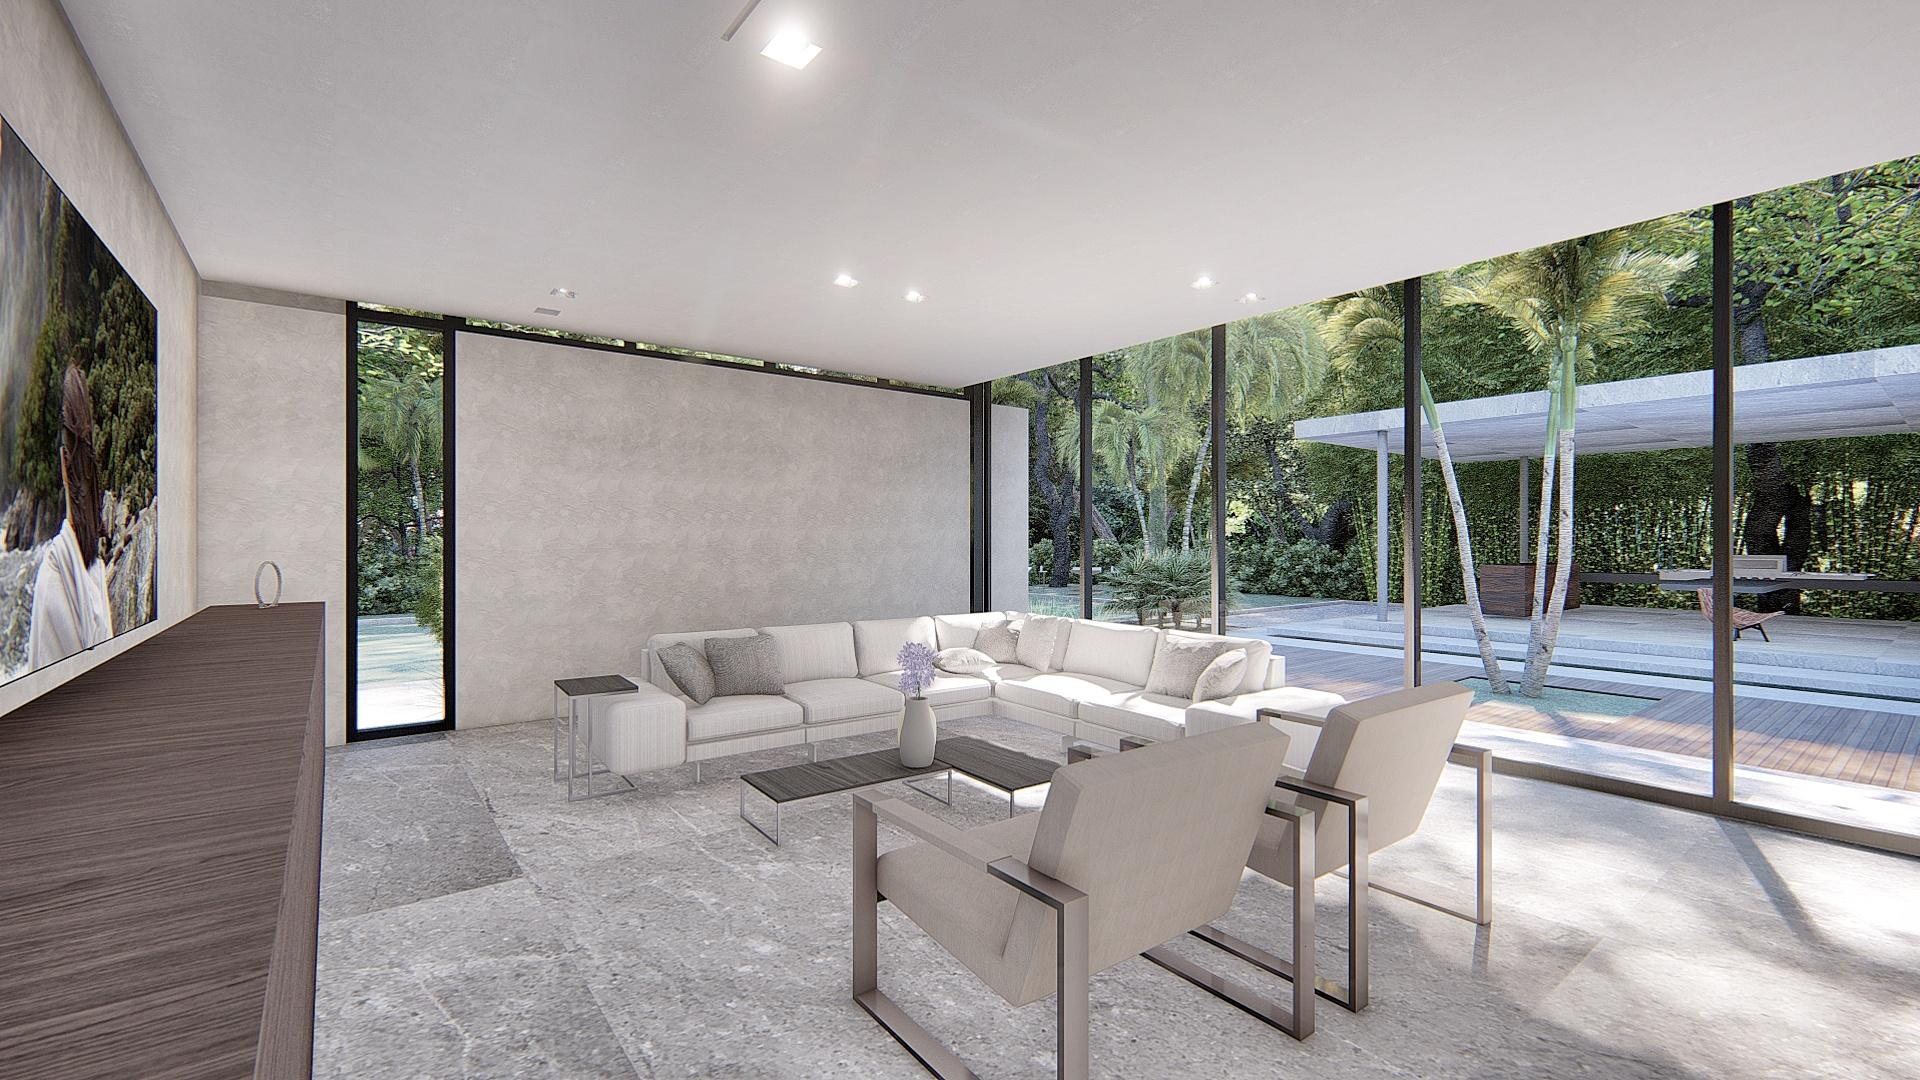 Contemporary Coconut Grove Miami Home by KoDA